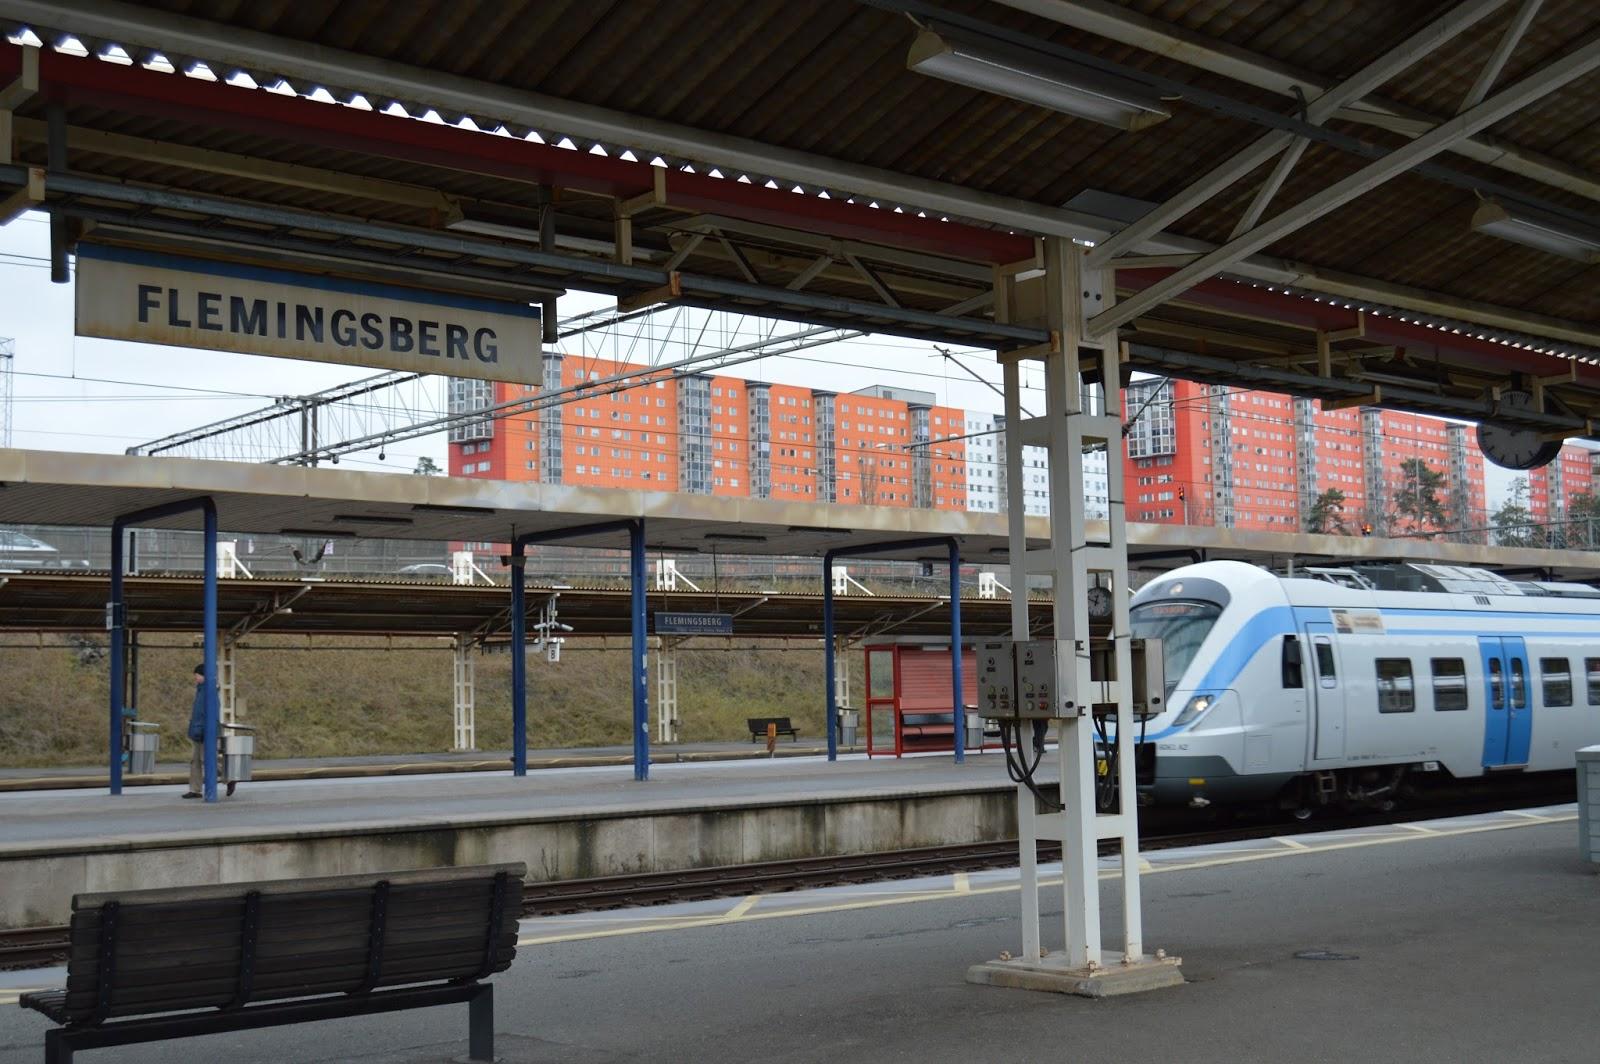 frisör flemingsberg station